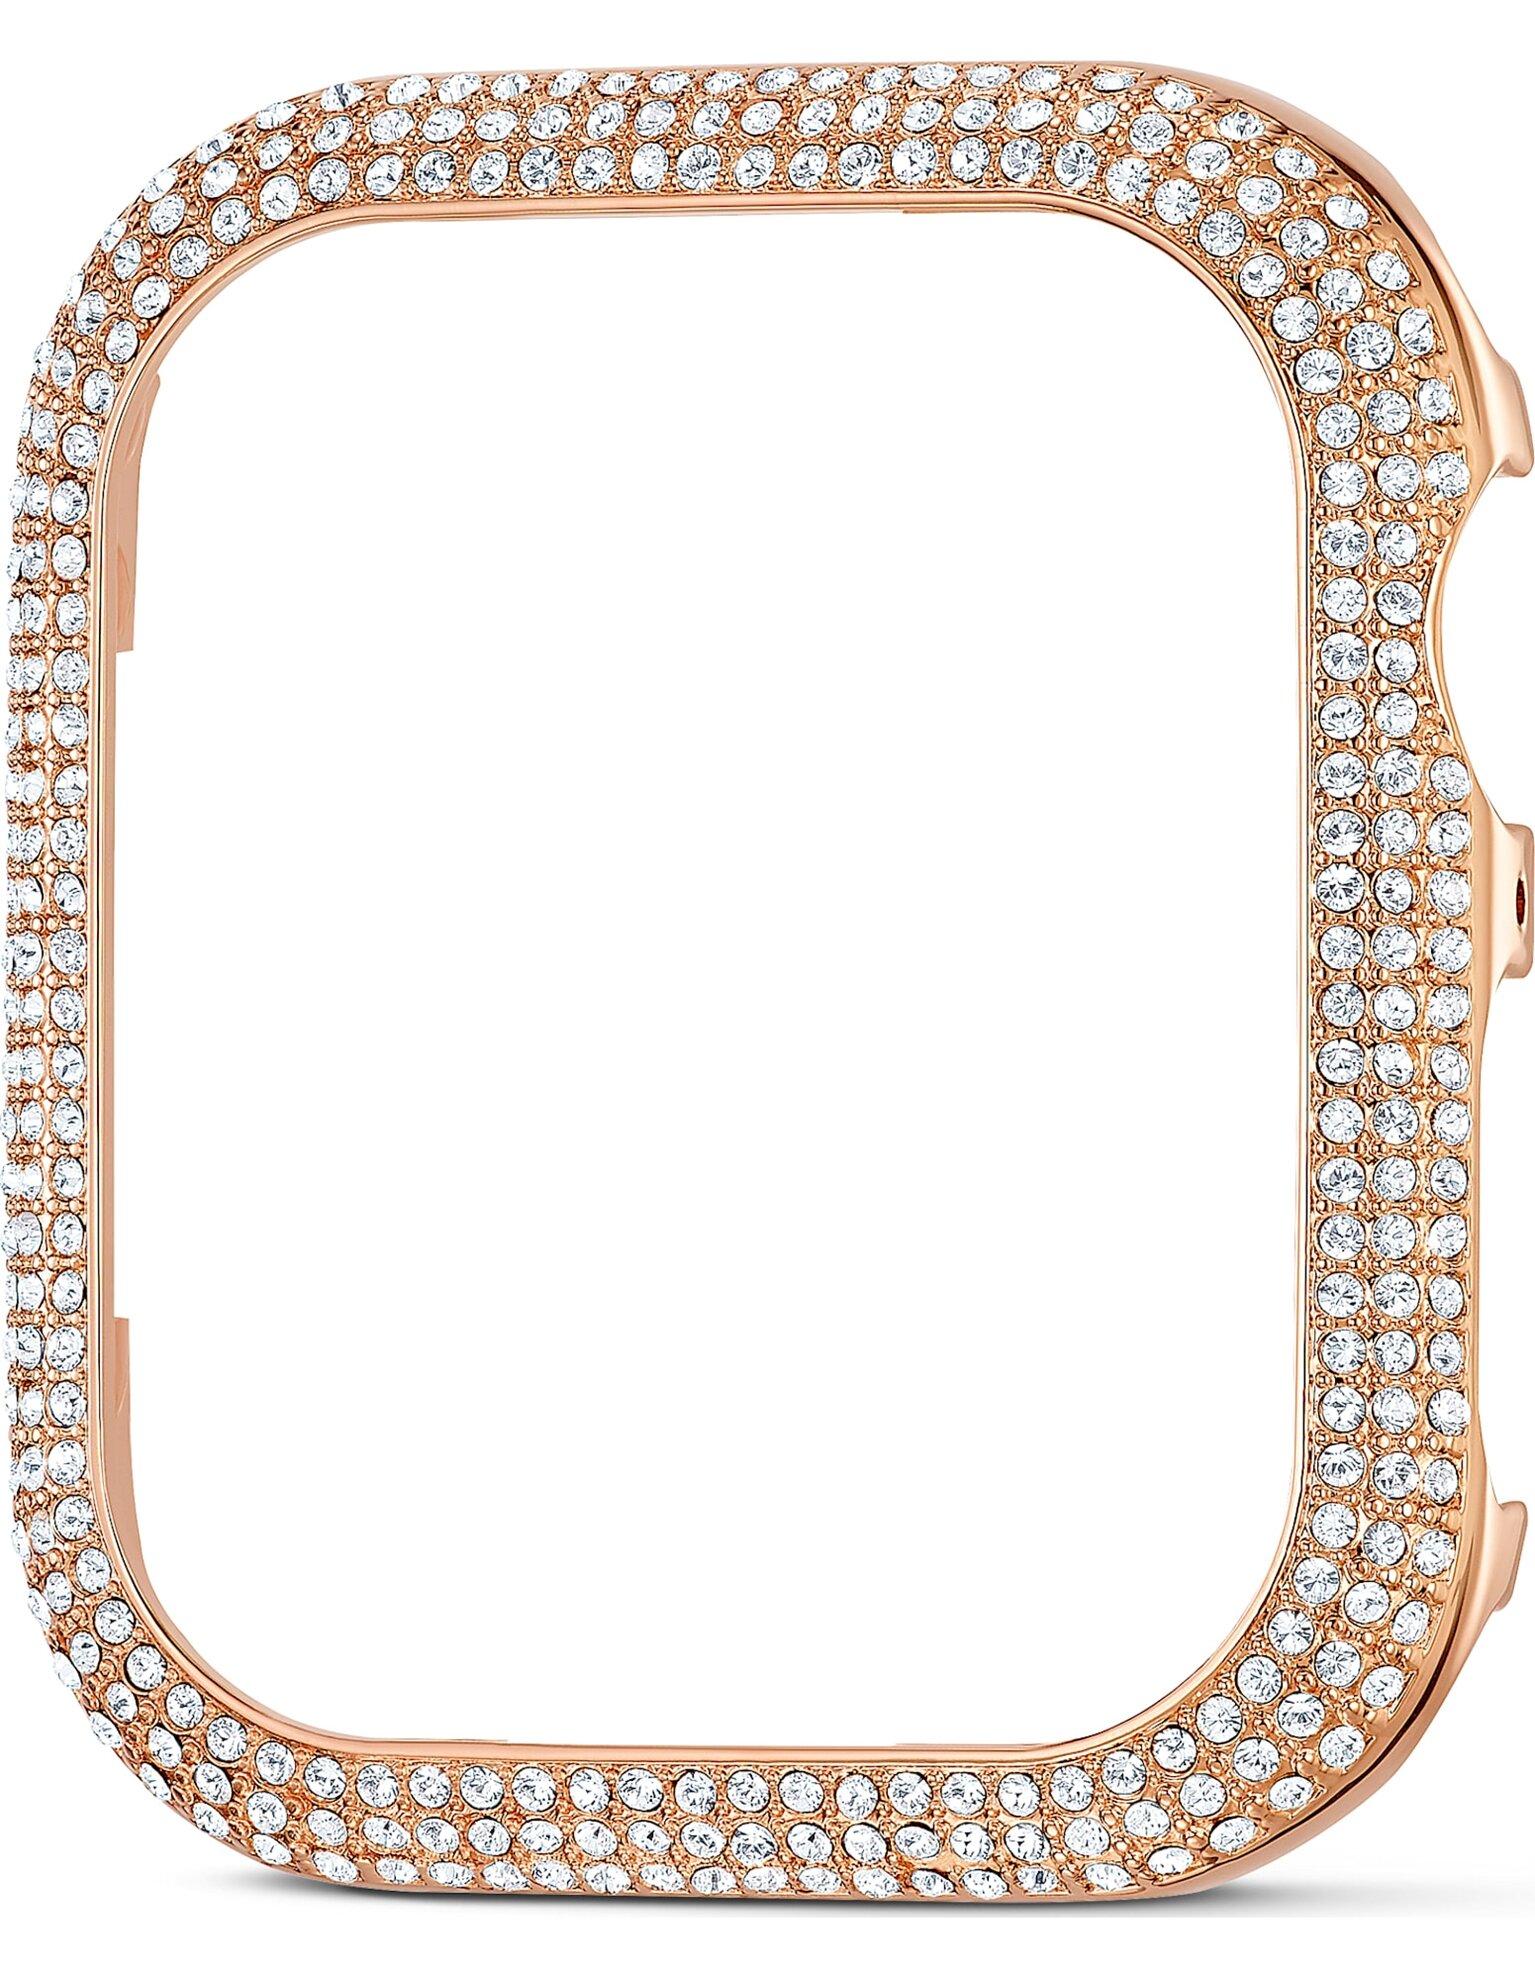 Picture of 40 mm Sparkling Apple Watch ® uyumlu kılıf, Rose Altın tonu